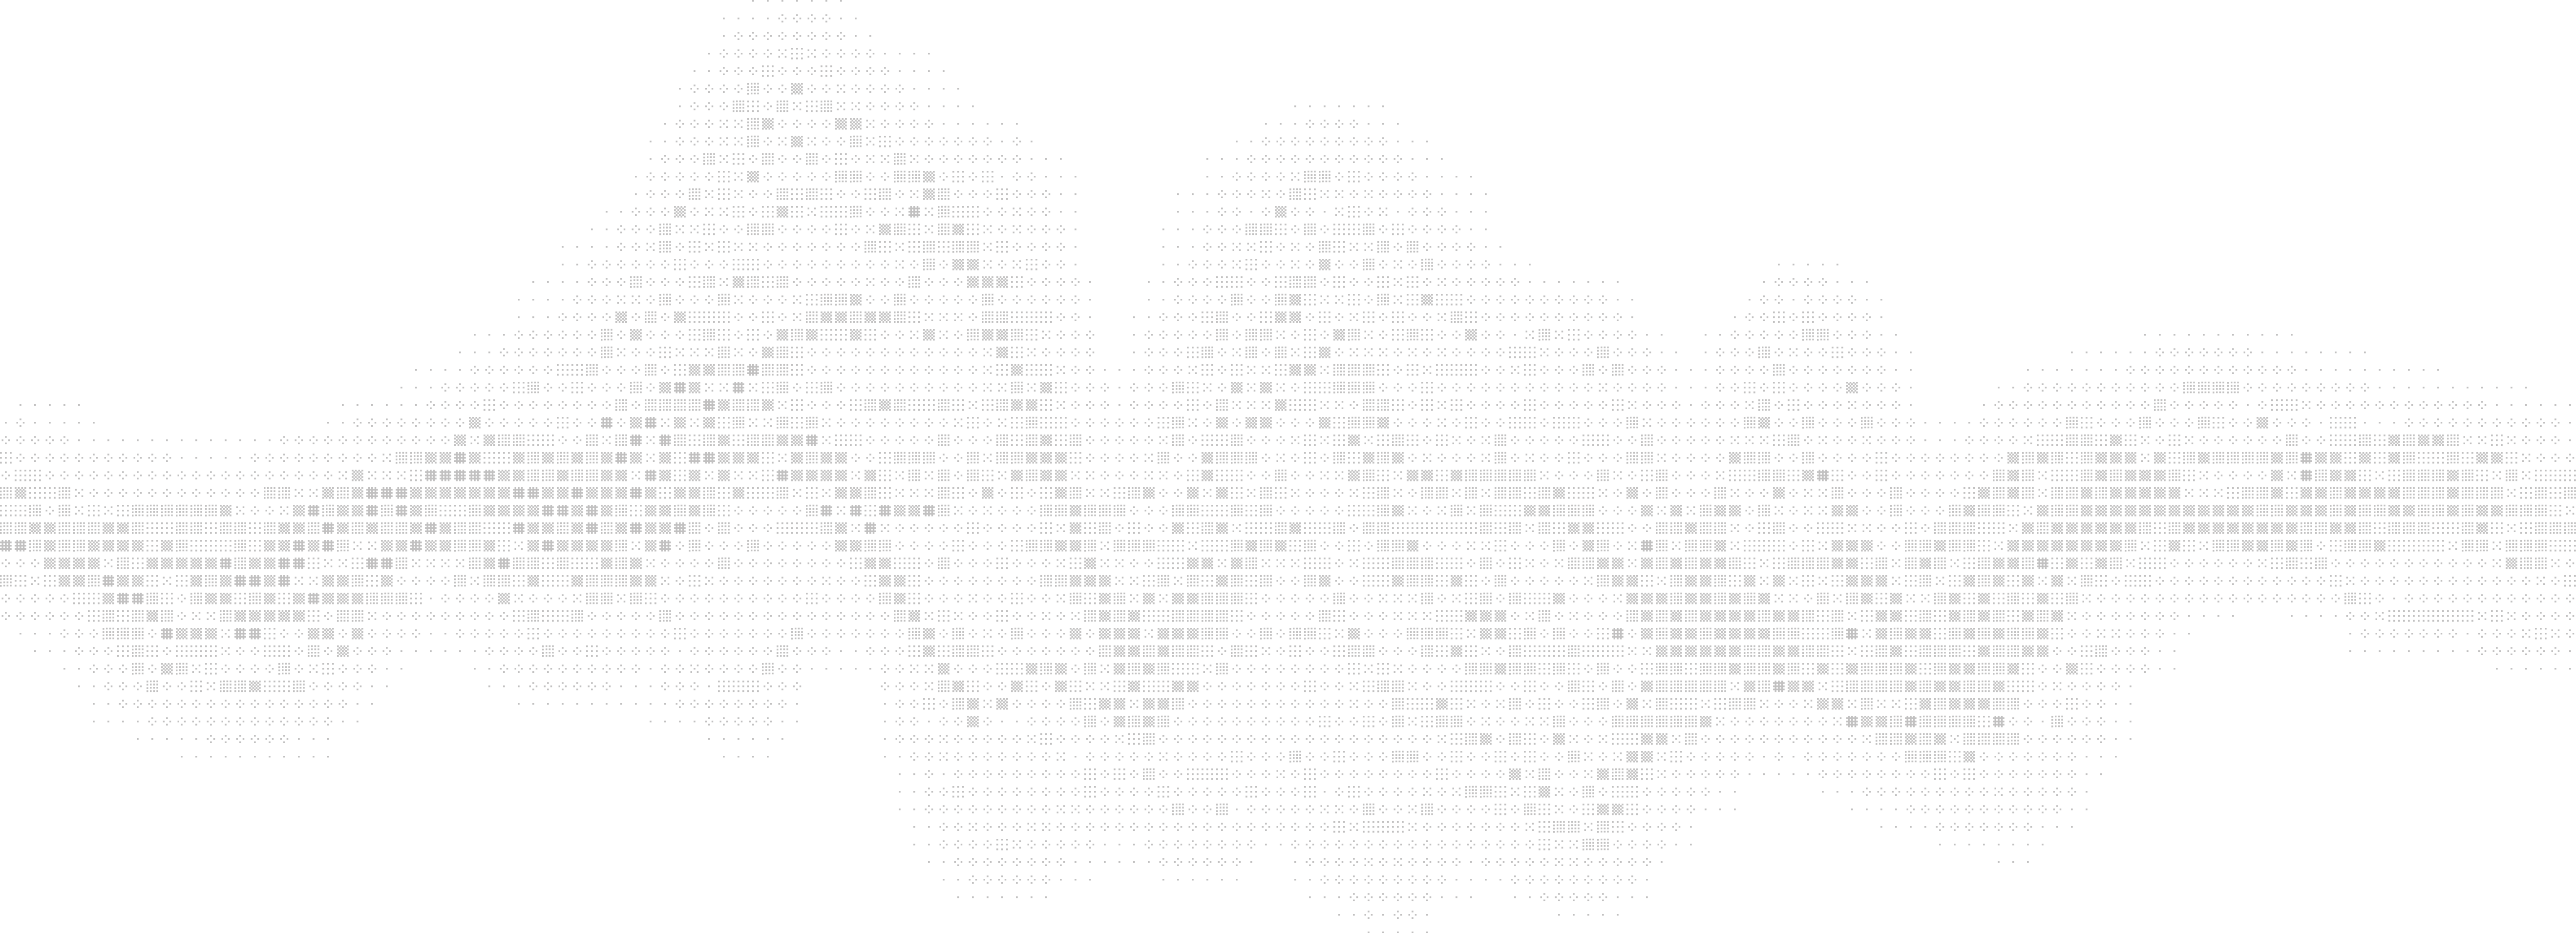 CLI_Texture_GrayLight-1